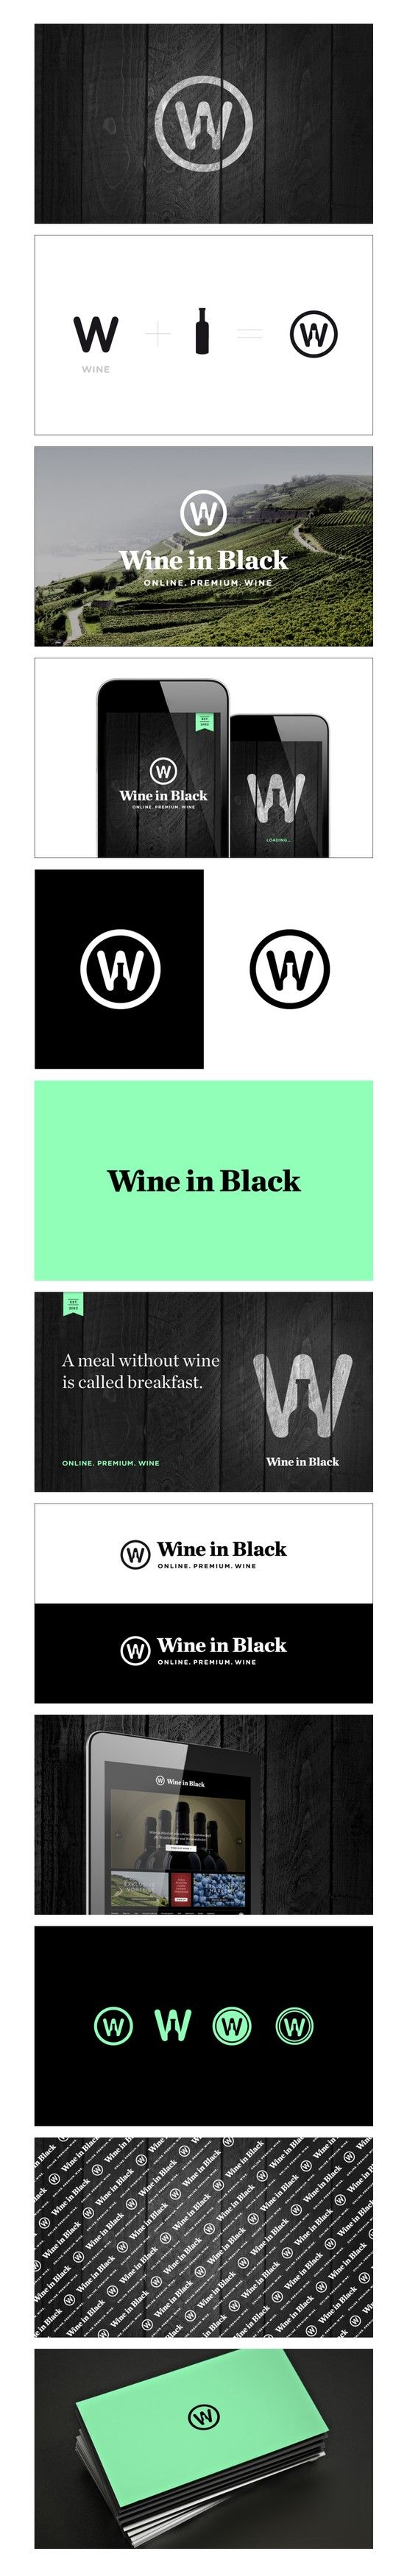 Wine in Black #design #corporate #identity #branding #visual